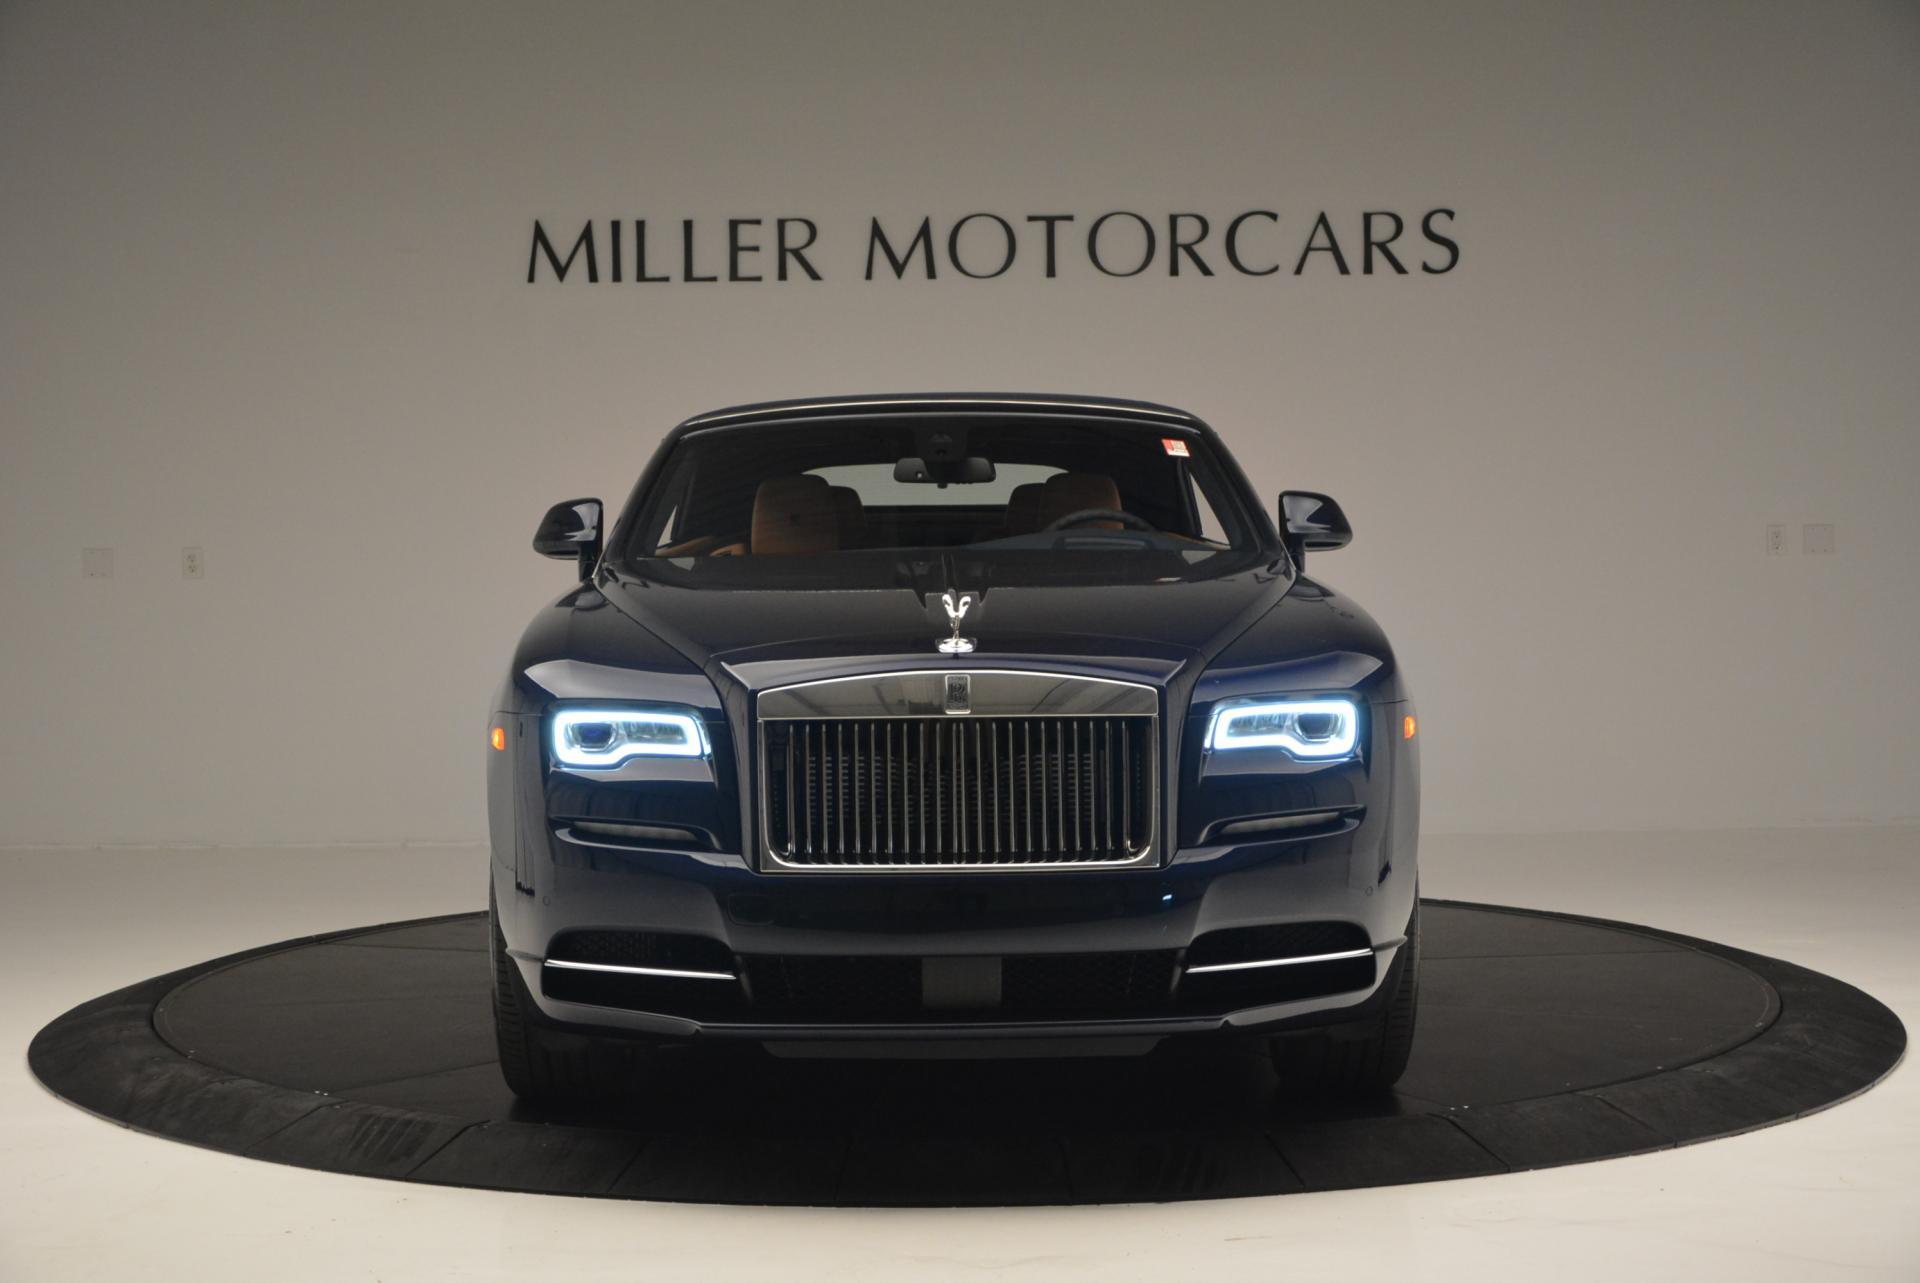 New 2016 Rolls-Royce Dawn  For Sale In Greenwich, CT 106_p13